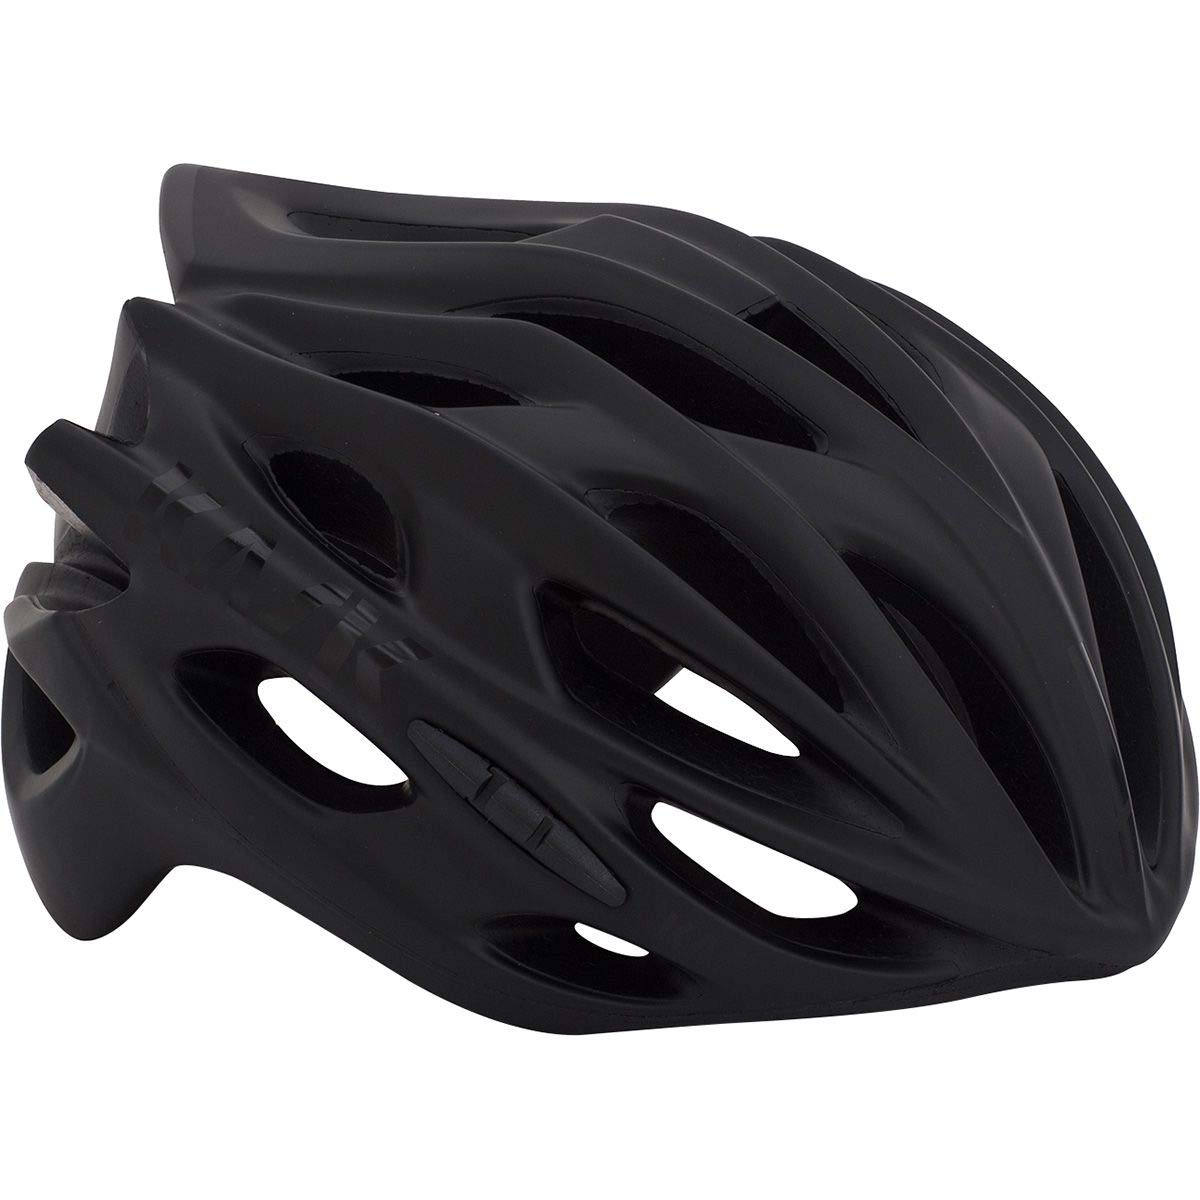 KASK(カスク) ヘルメット MOJITO X BLK MATT L サイズ:59-62cm   B07K32B59S